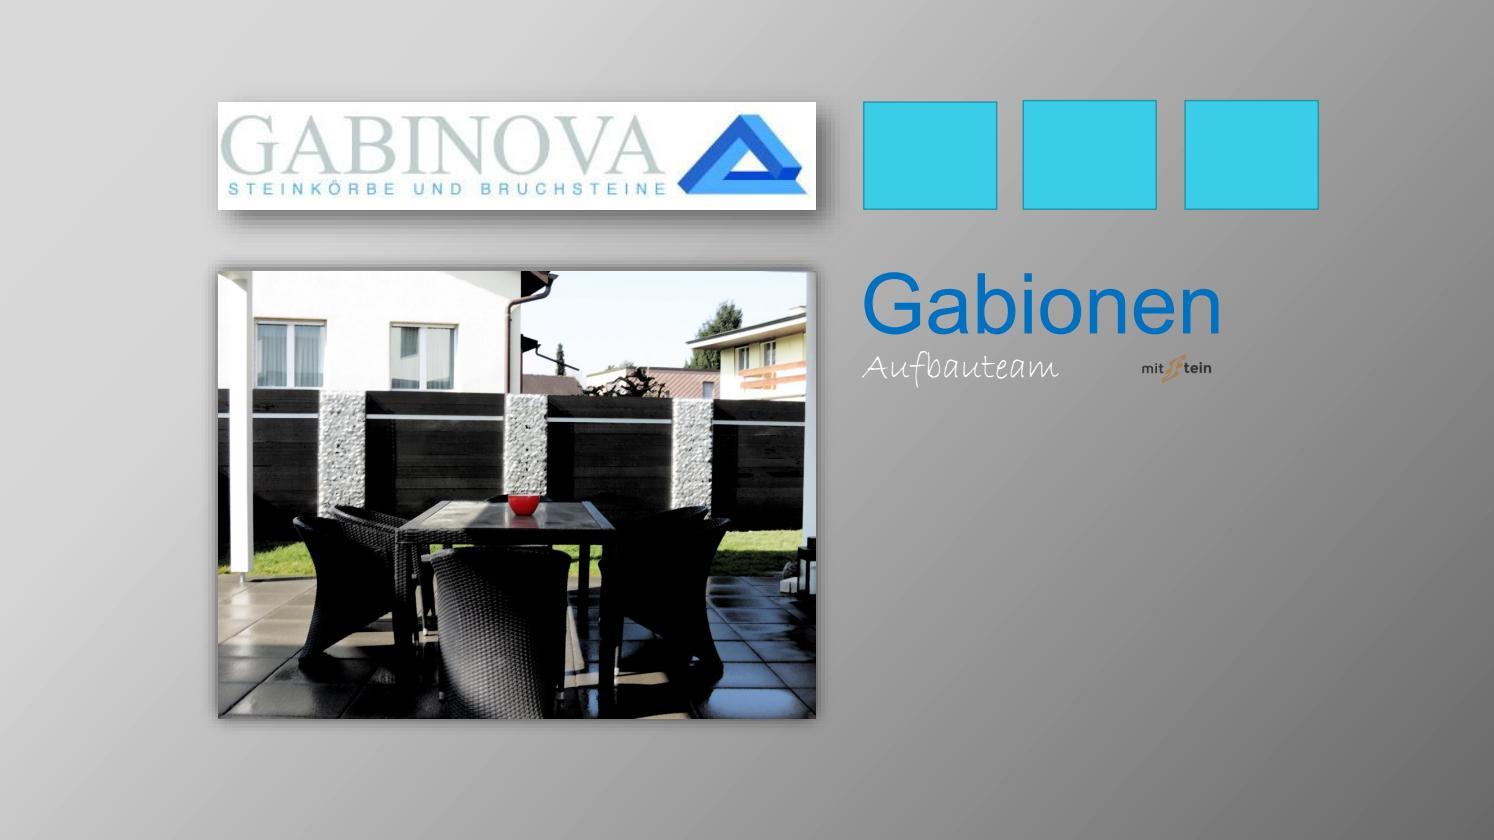 Gabionen Aufbauteam Von Gabinova By Gabinova Gmbh Issuu